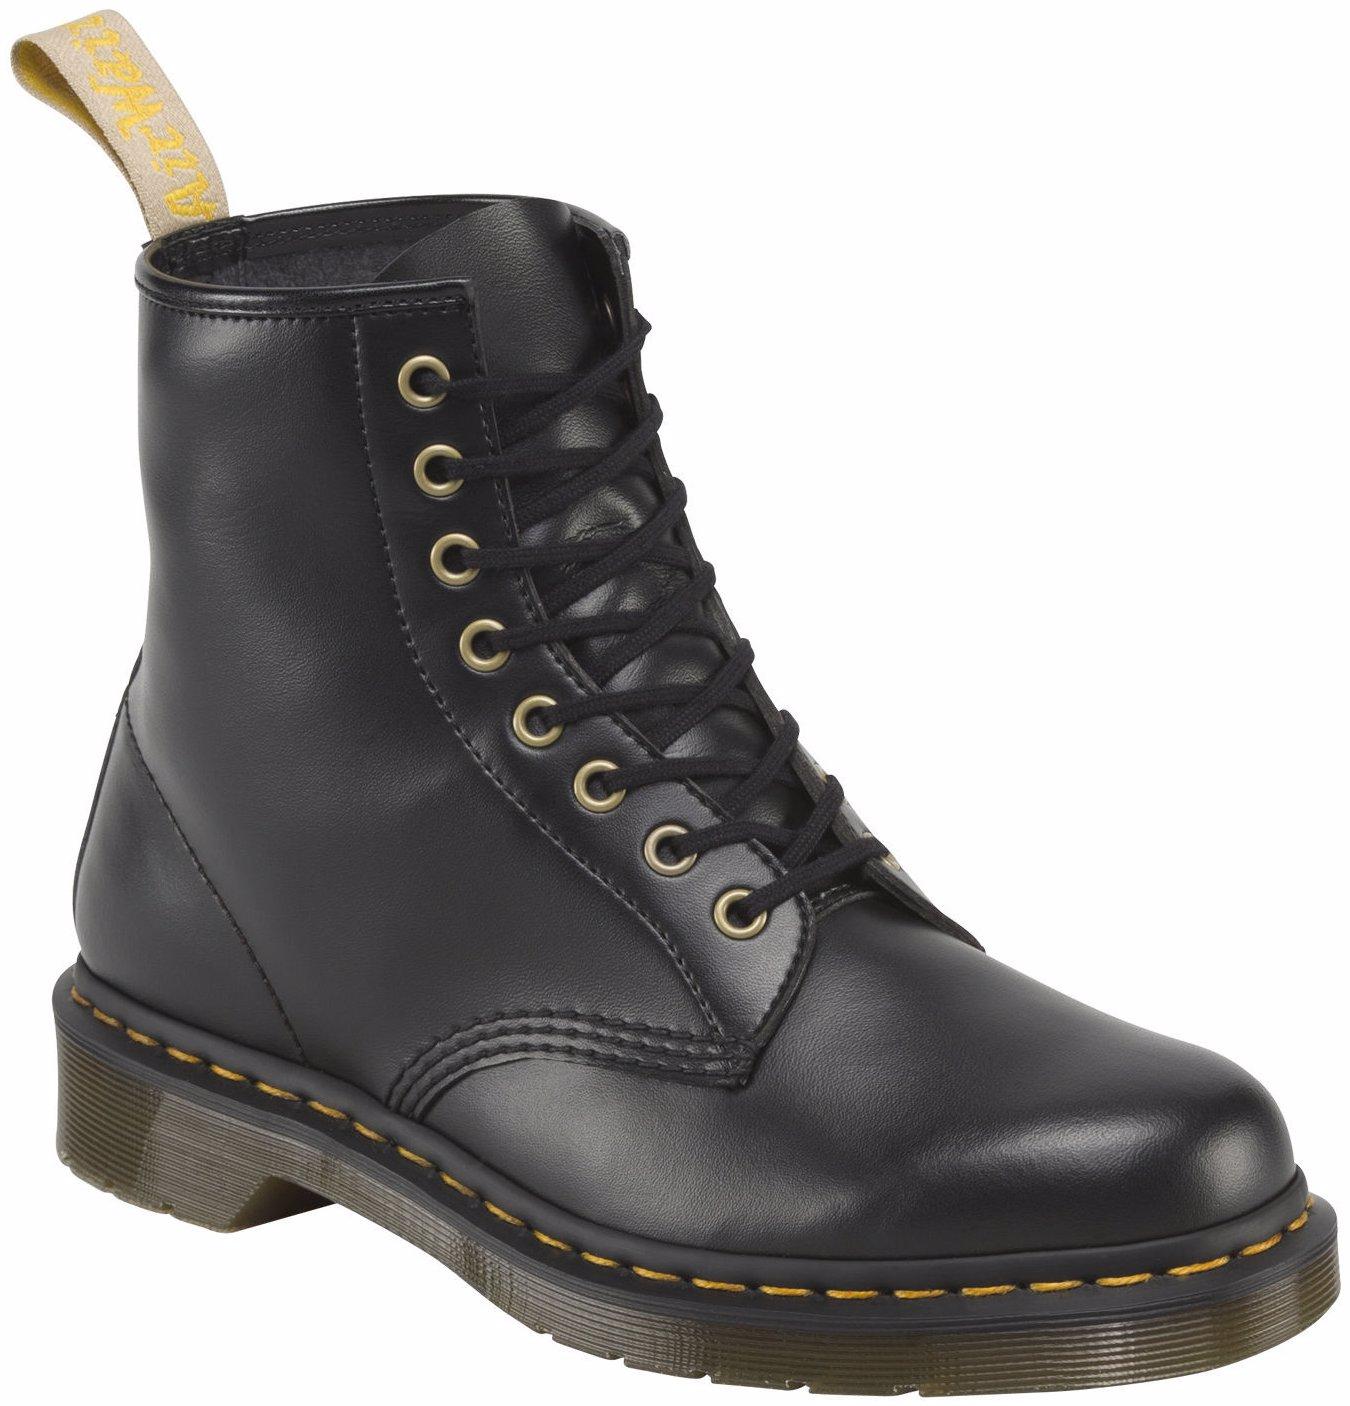 64c05039574e6 VEGAN Unisex 1460 8 Eye Lace Up Genuine Boots Eco Friendly Shoes Doc